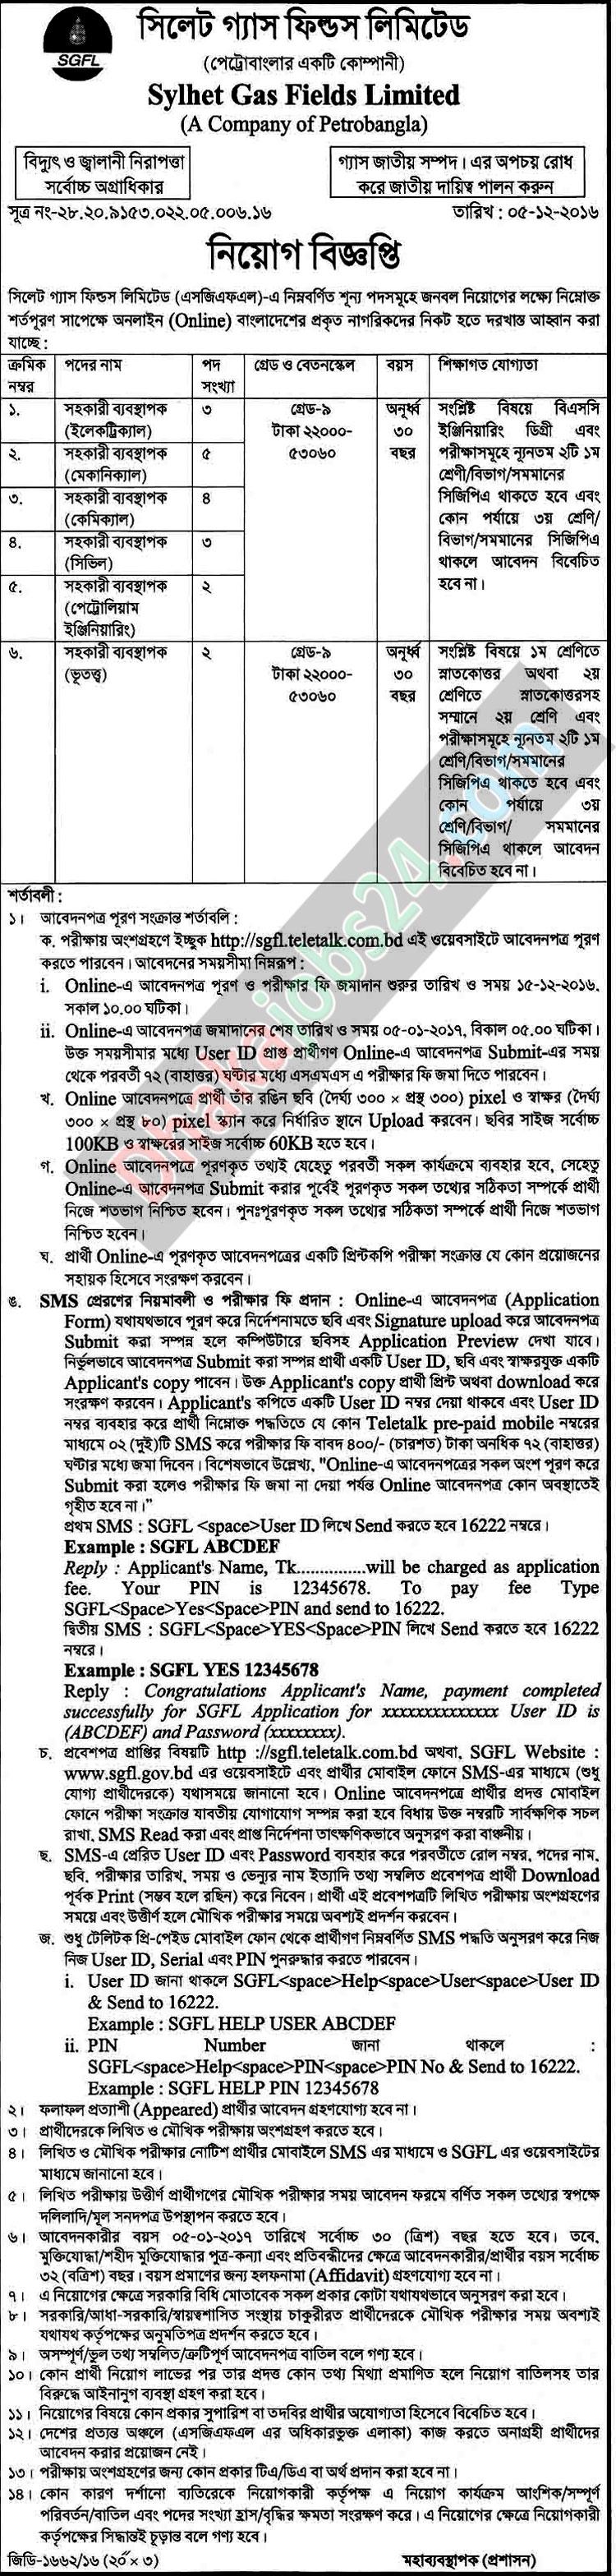 Sylhet Gas Fields Limited Job Circular 2016